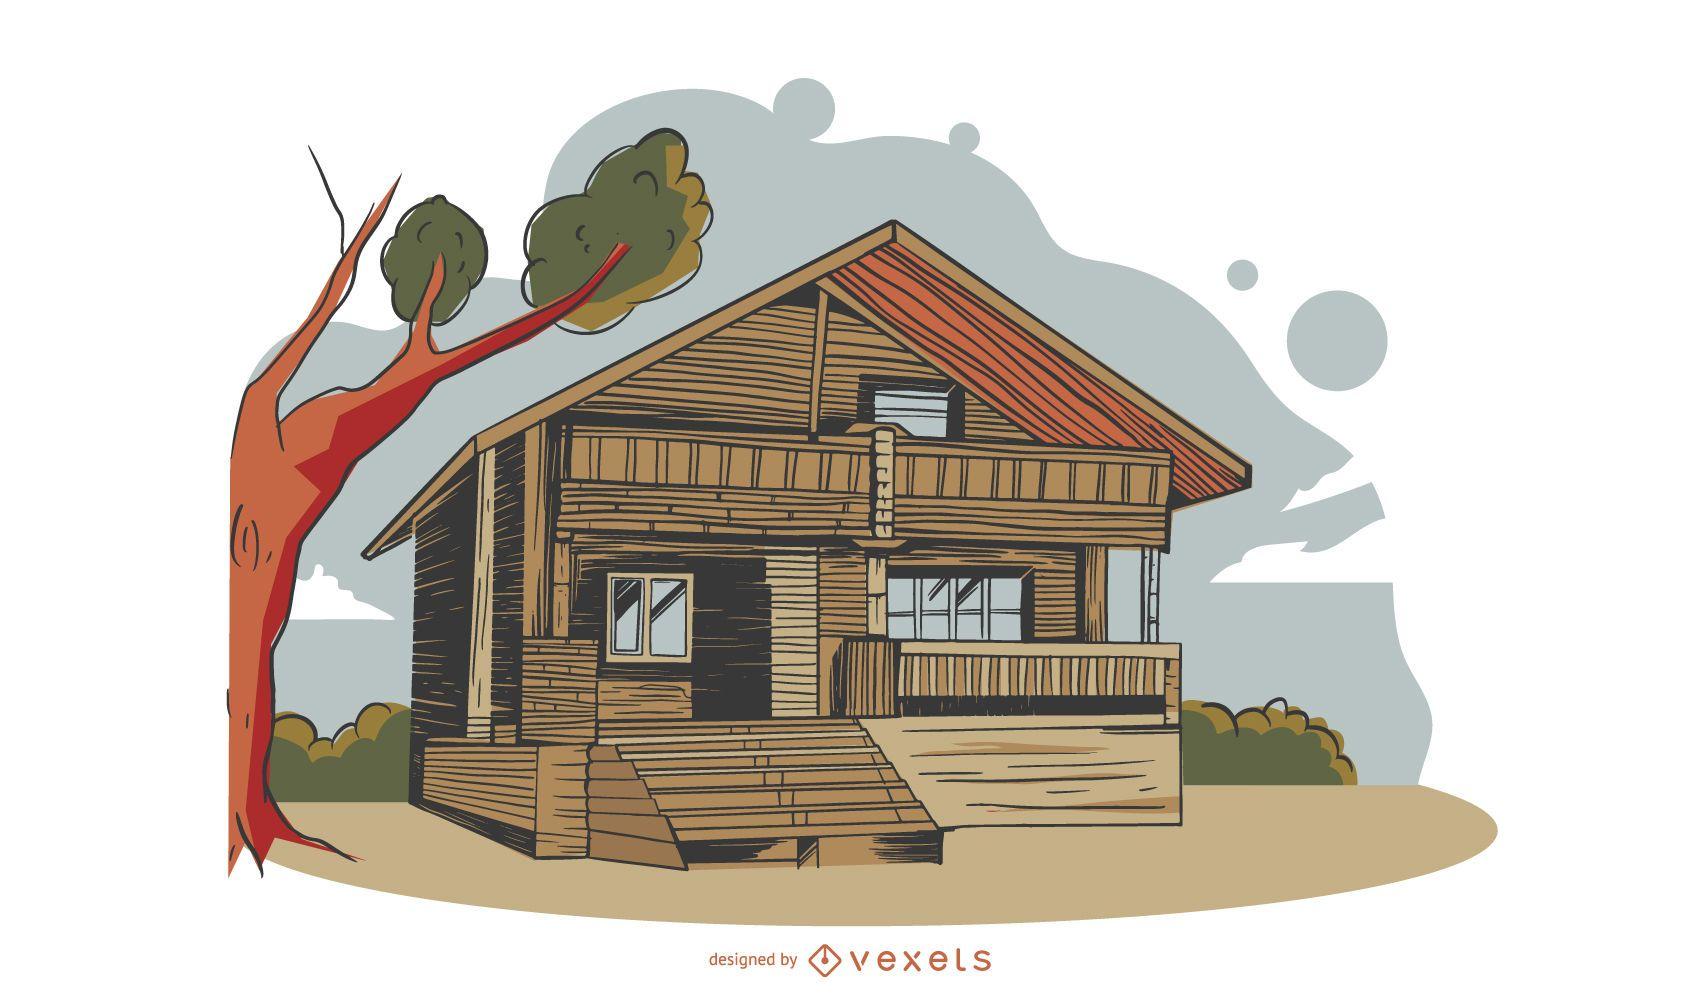 Diseño de edificio ecológico a color